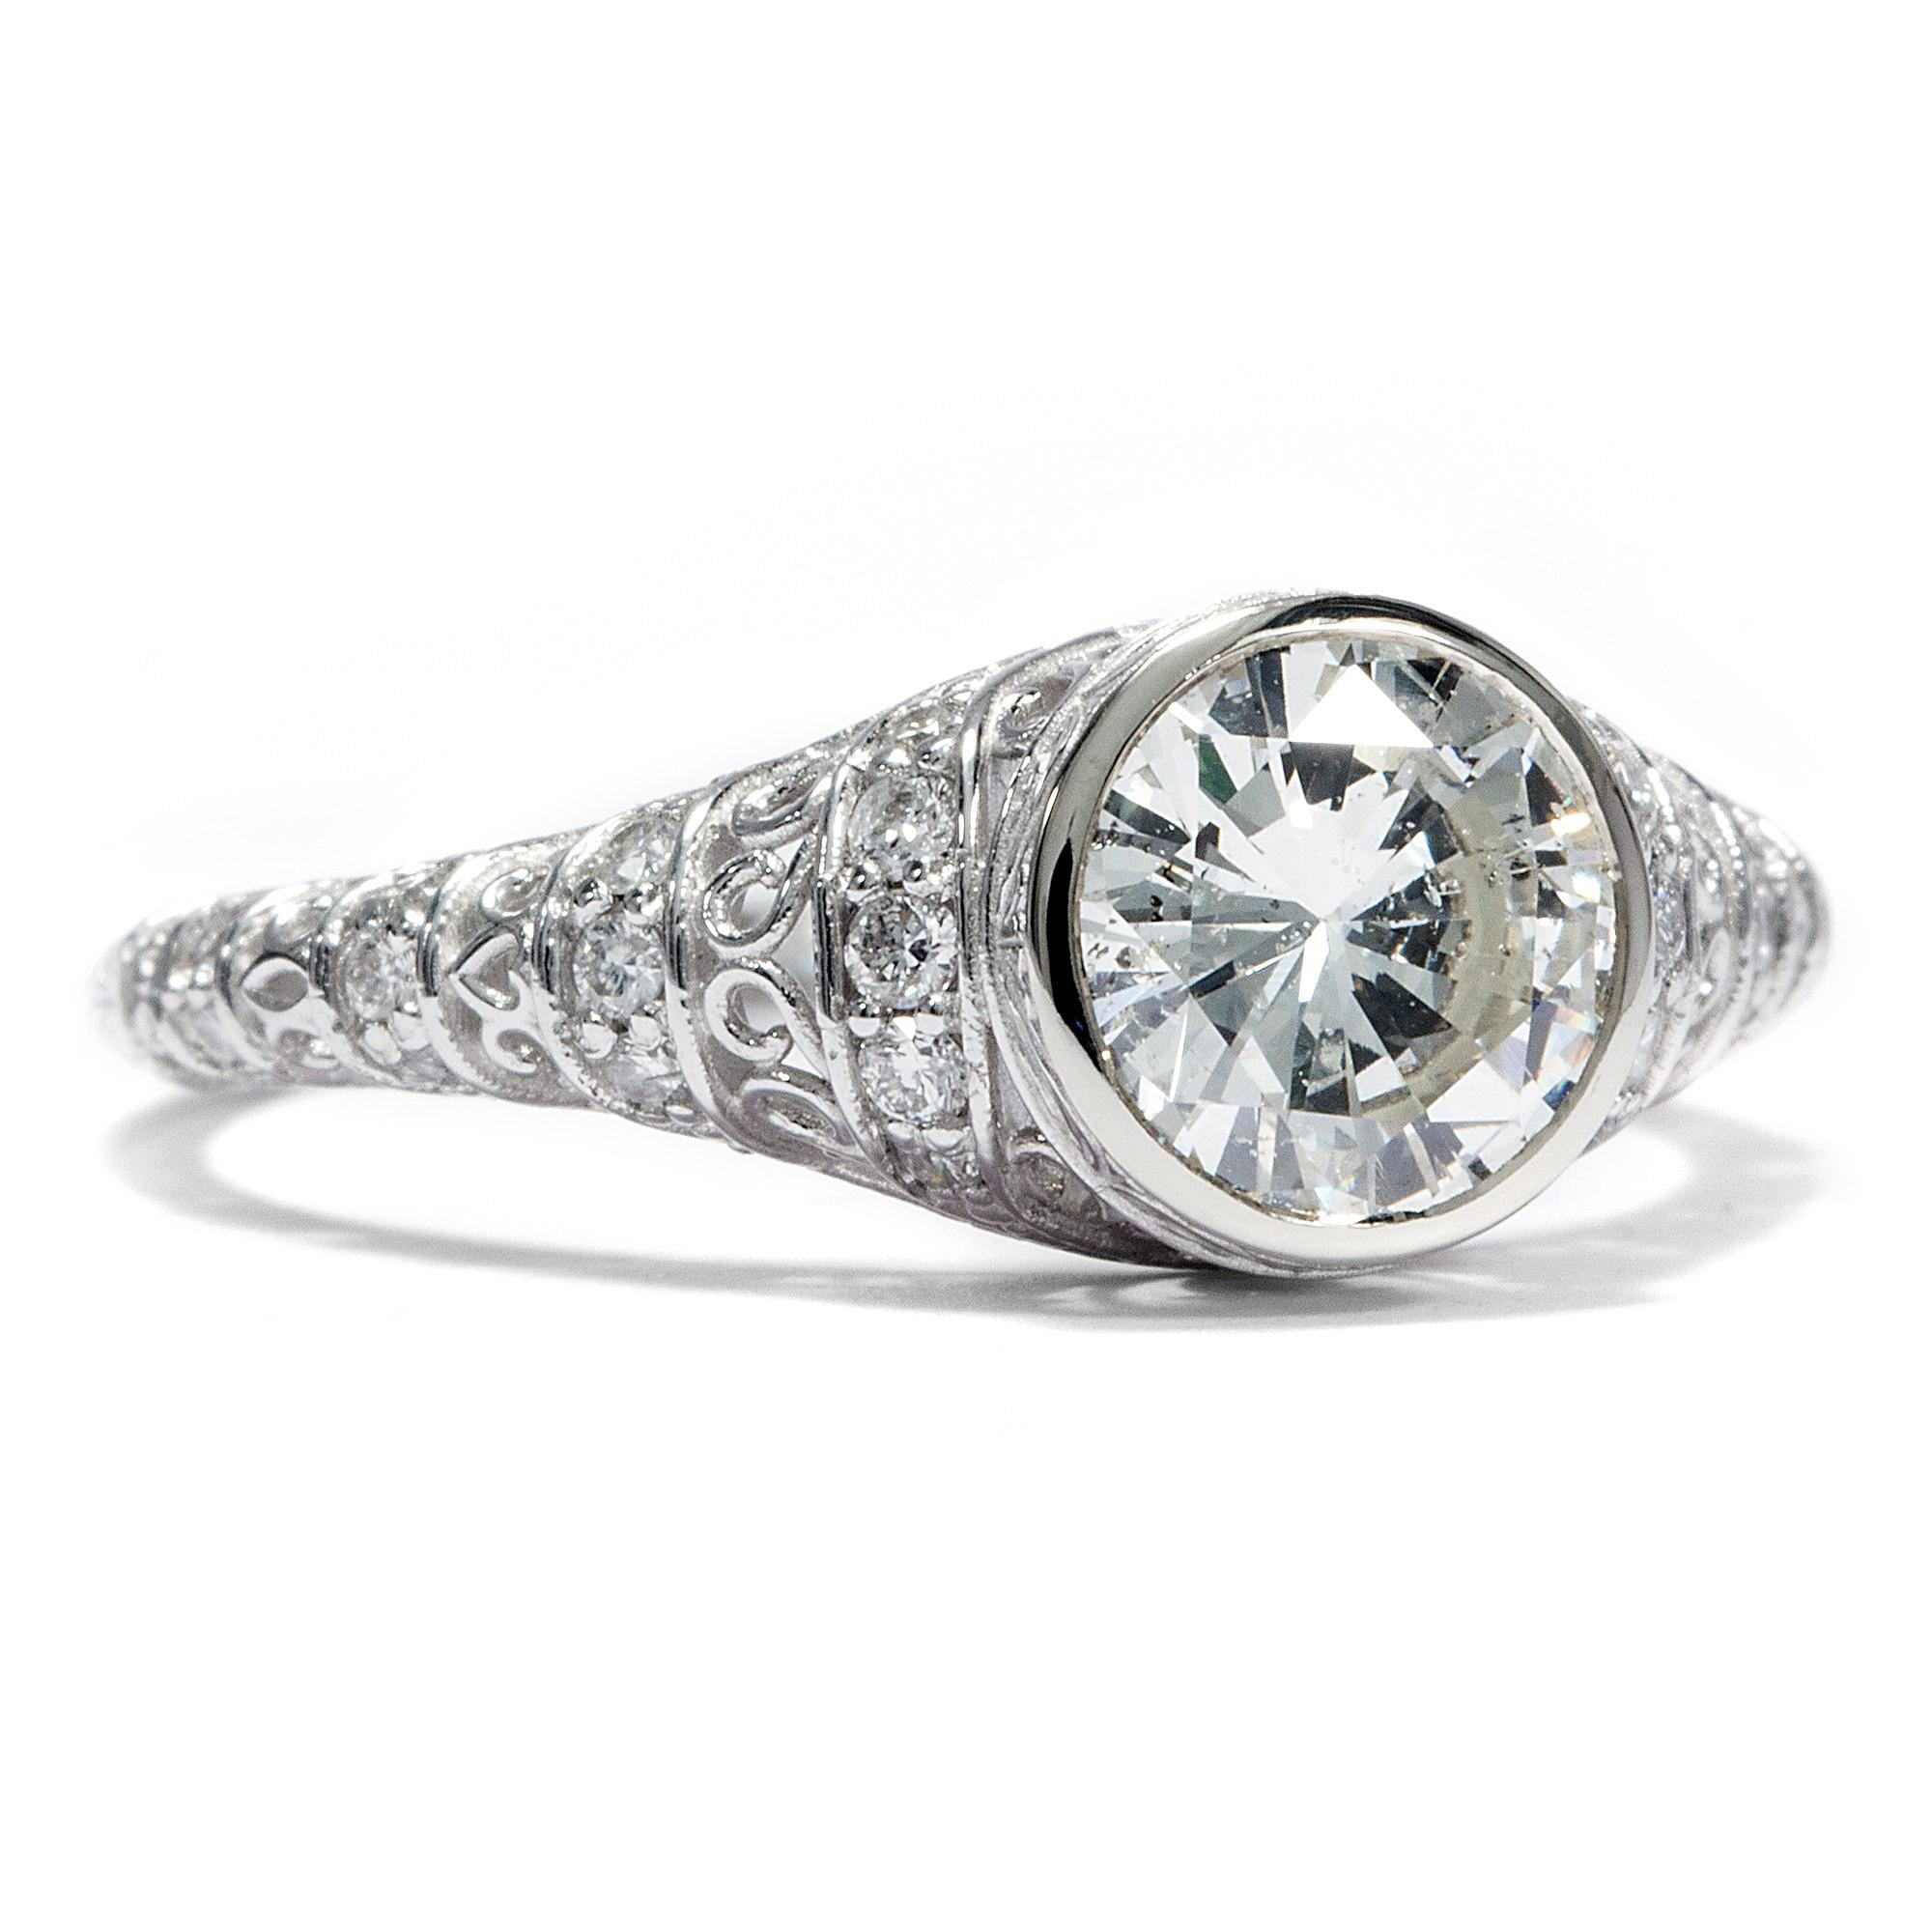 einkar ter diamant solit r ring in 585 wei gold brillant verlobungsring diamond ebay. Black Bedroom Furniture Sets. Home Design Ideas